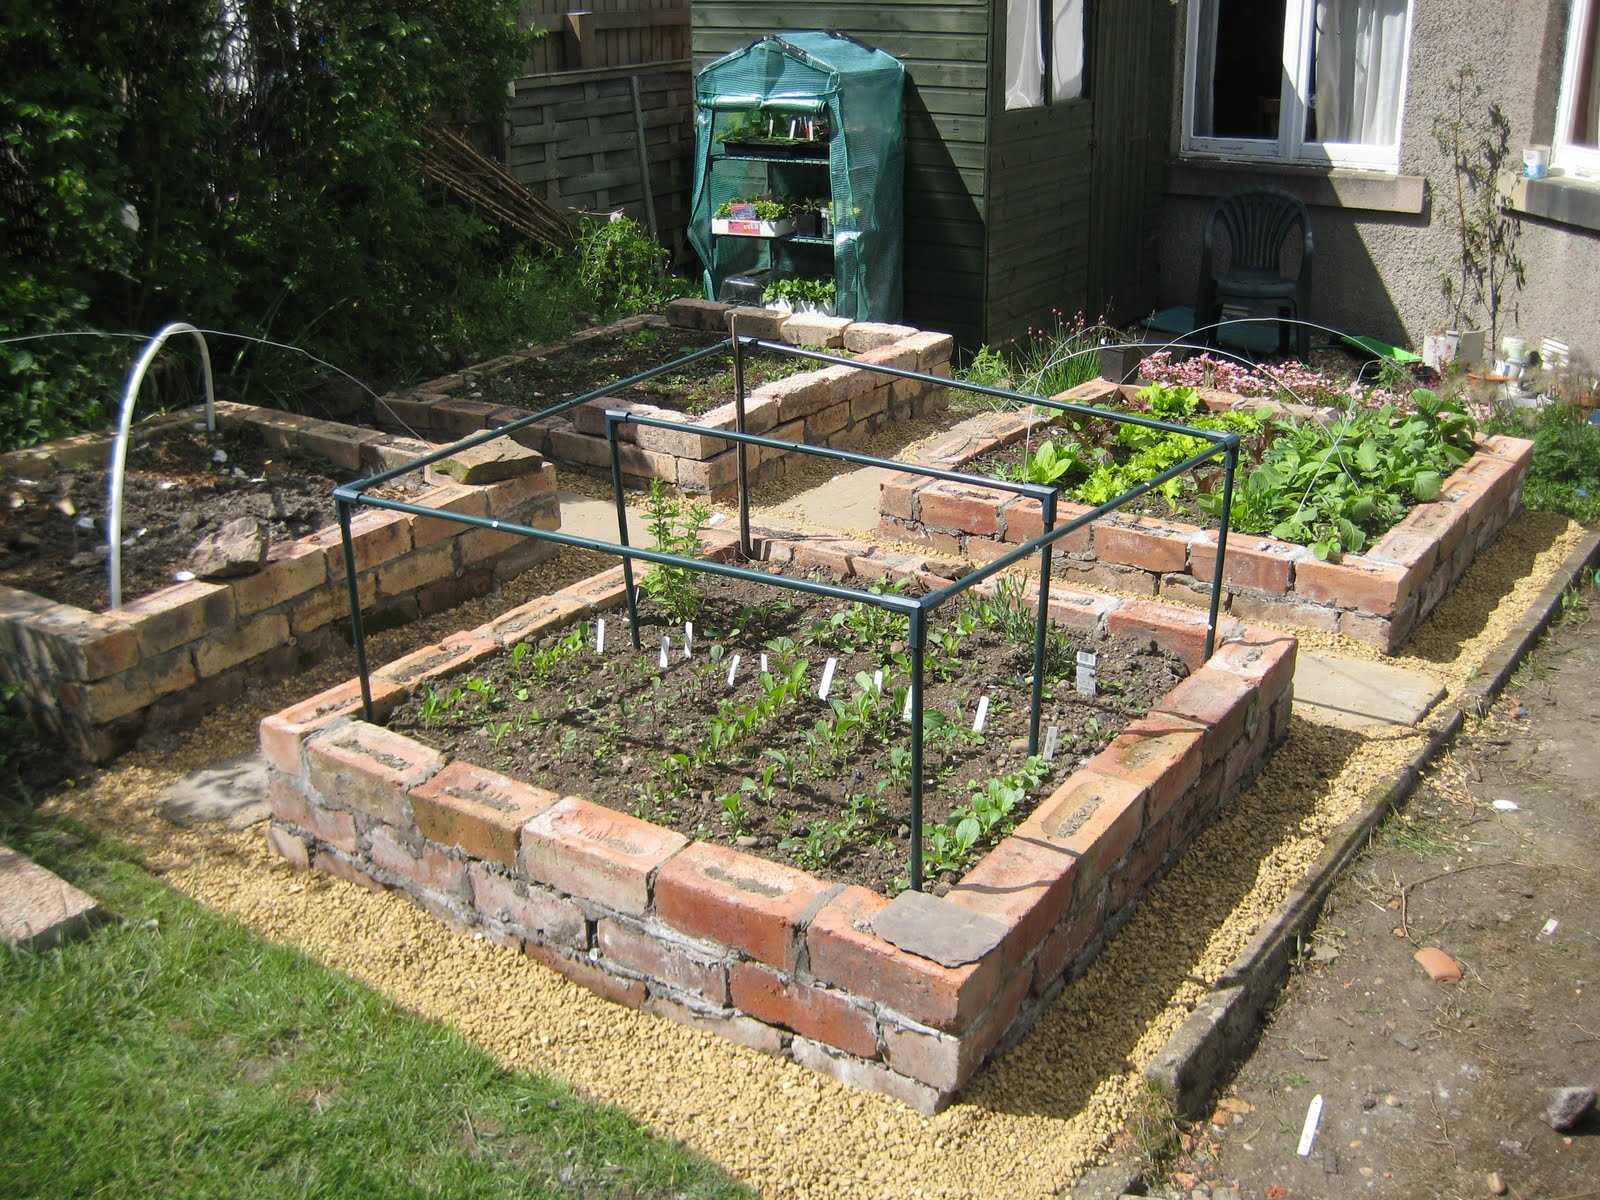 Gardens Raised: Mal's Allotment: Brick Raised Beds Update